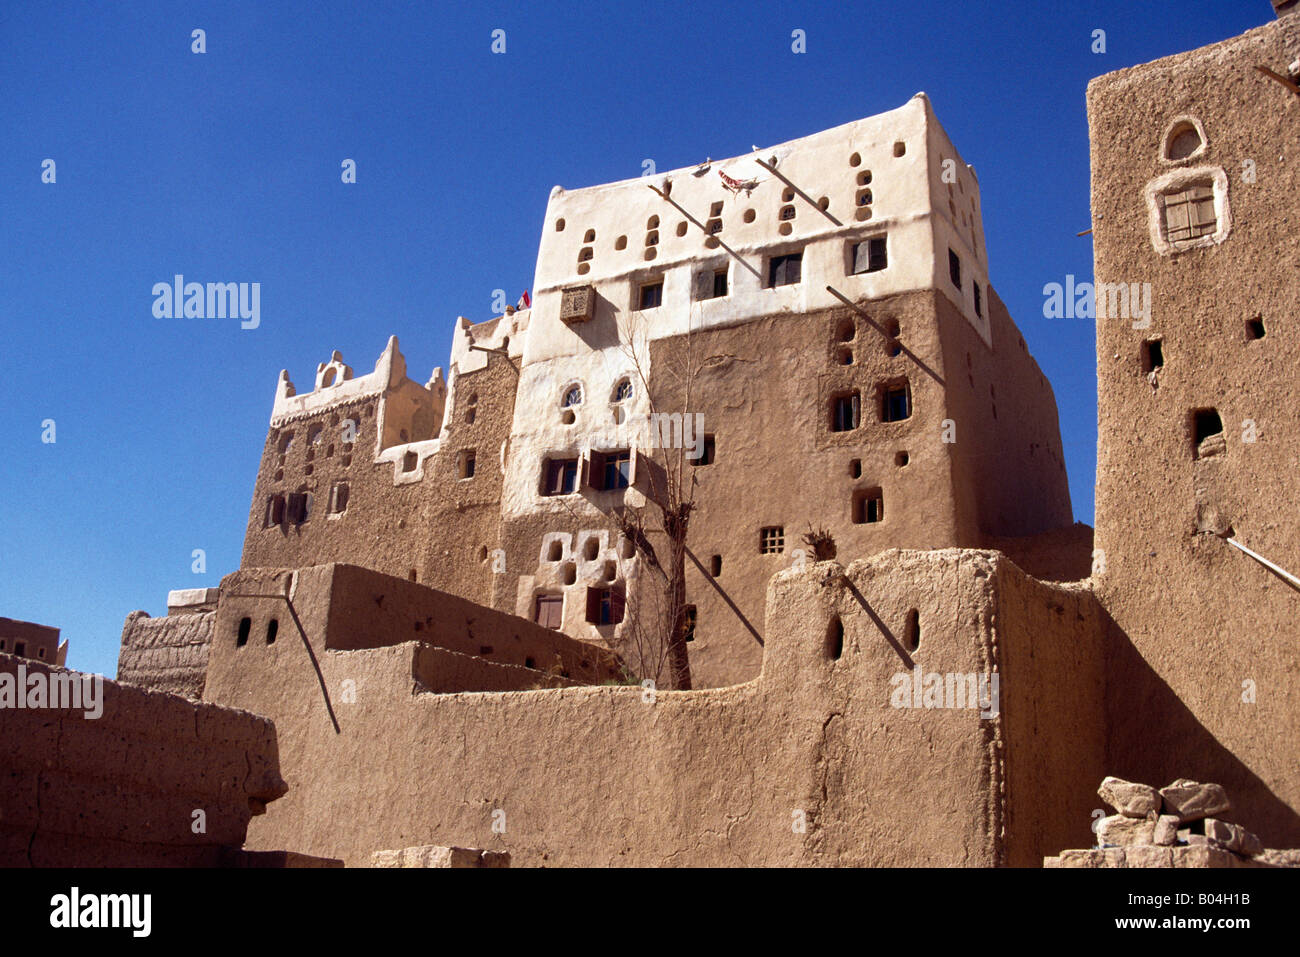 Sada Yemen Mud Houses Oasis Town On Edge Of Empty Quarter - Stock Image